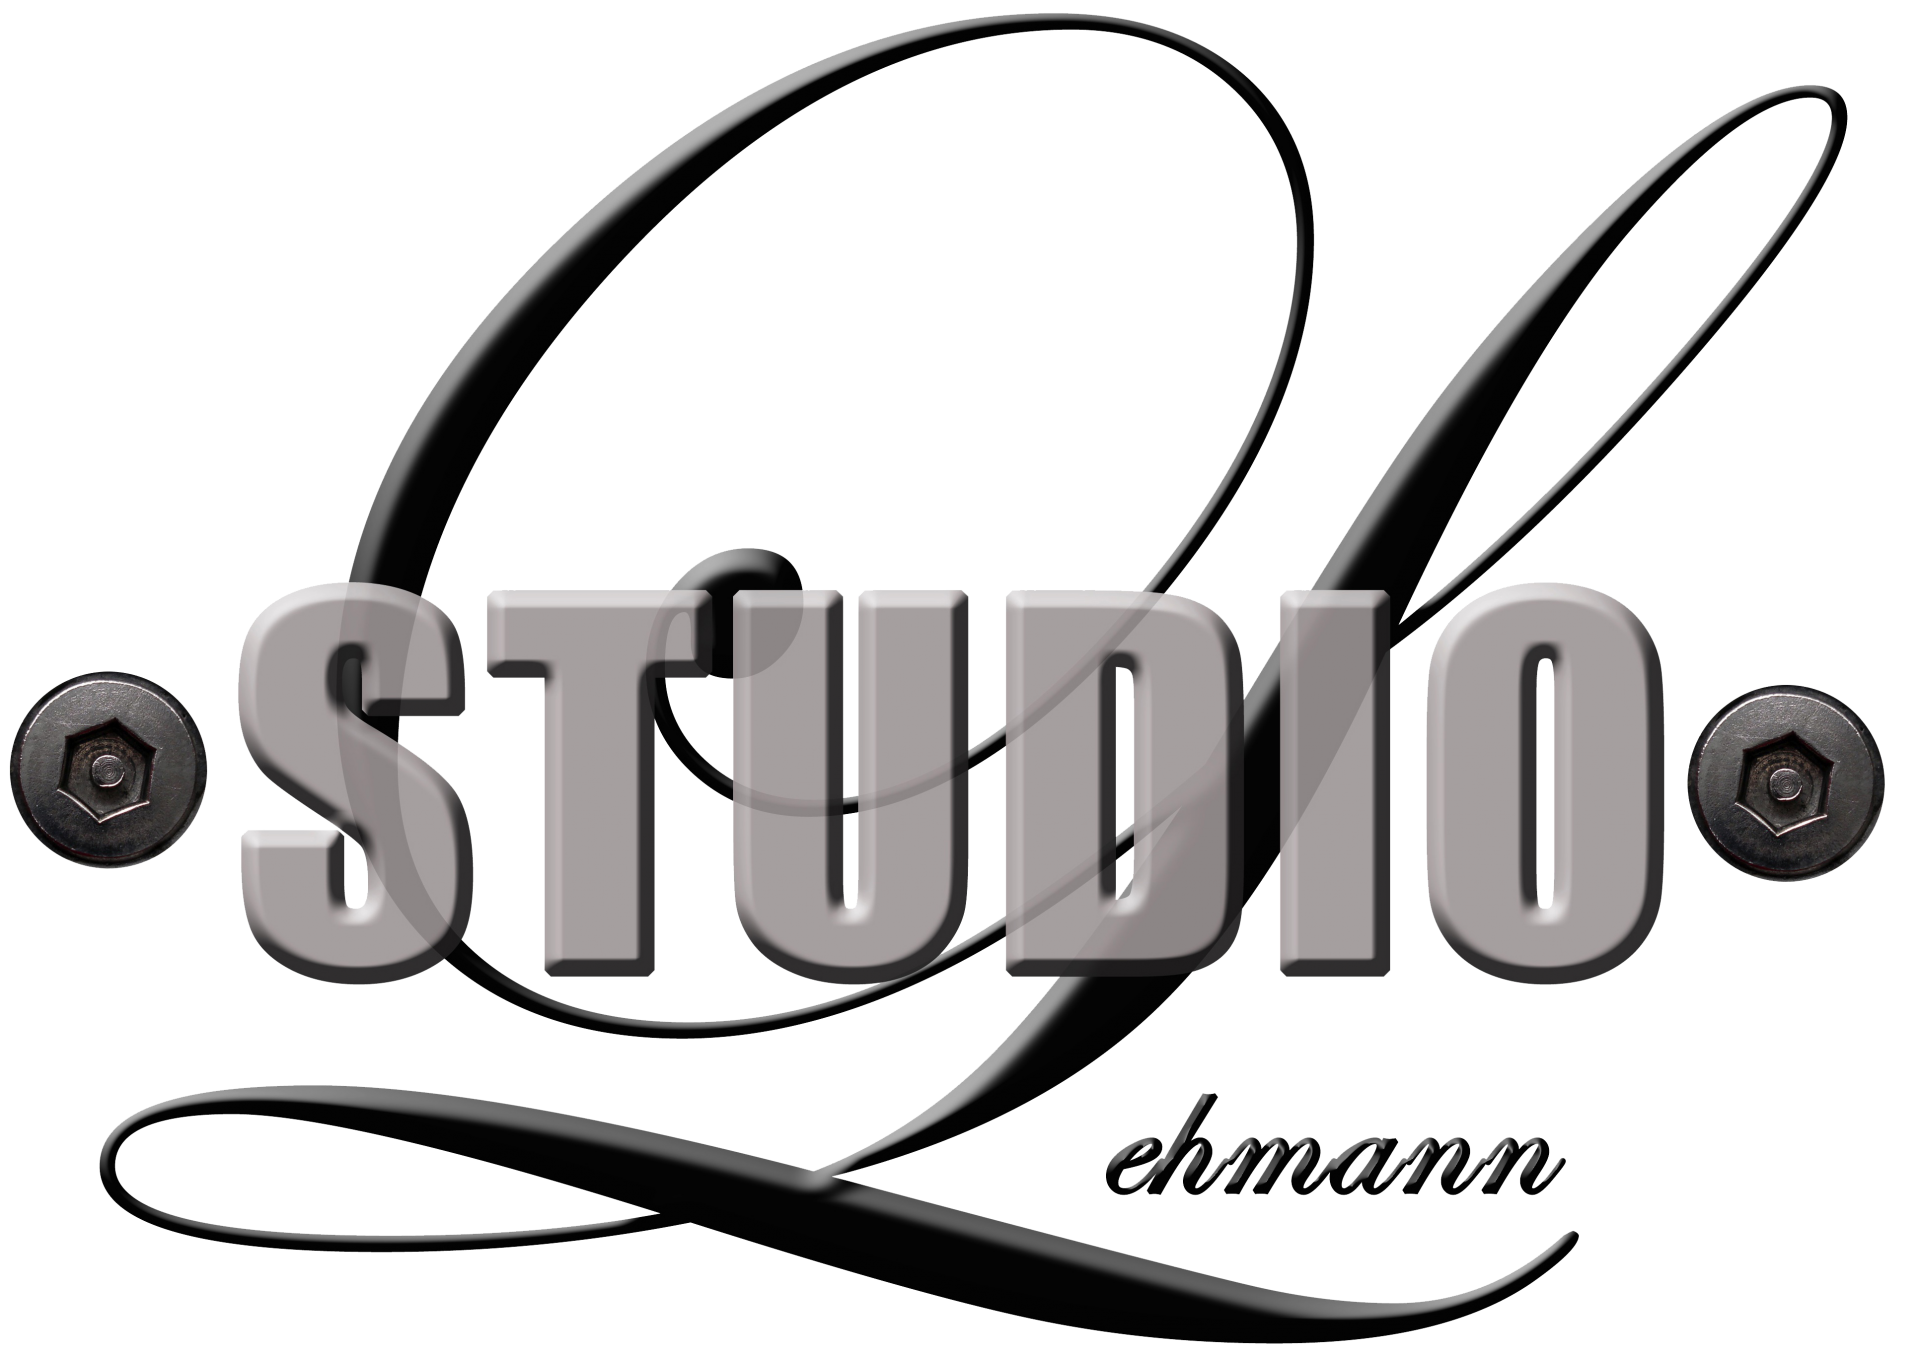 Lehmann studio